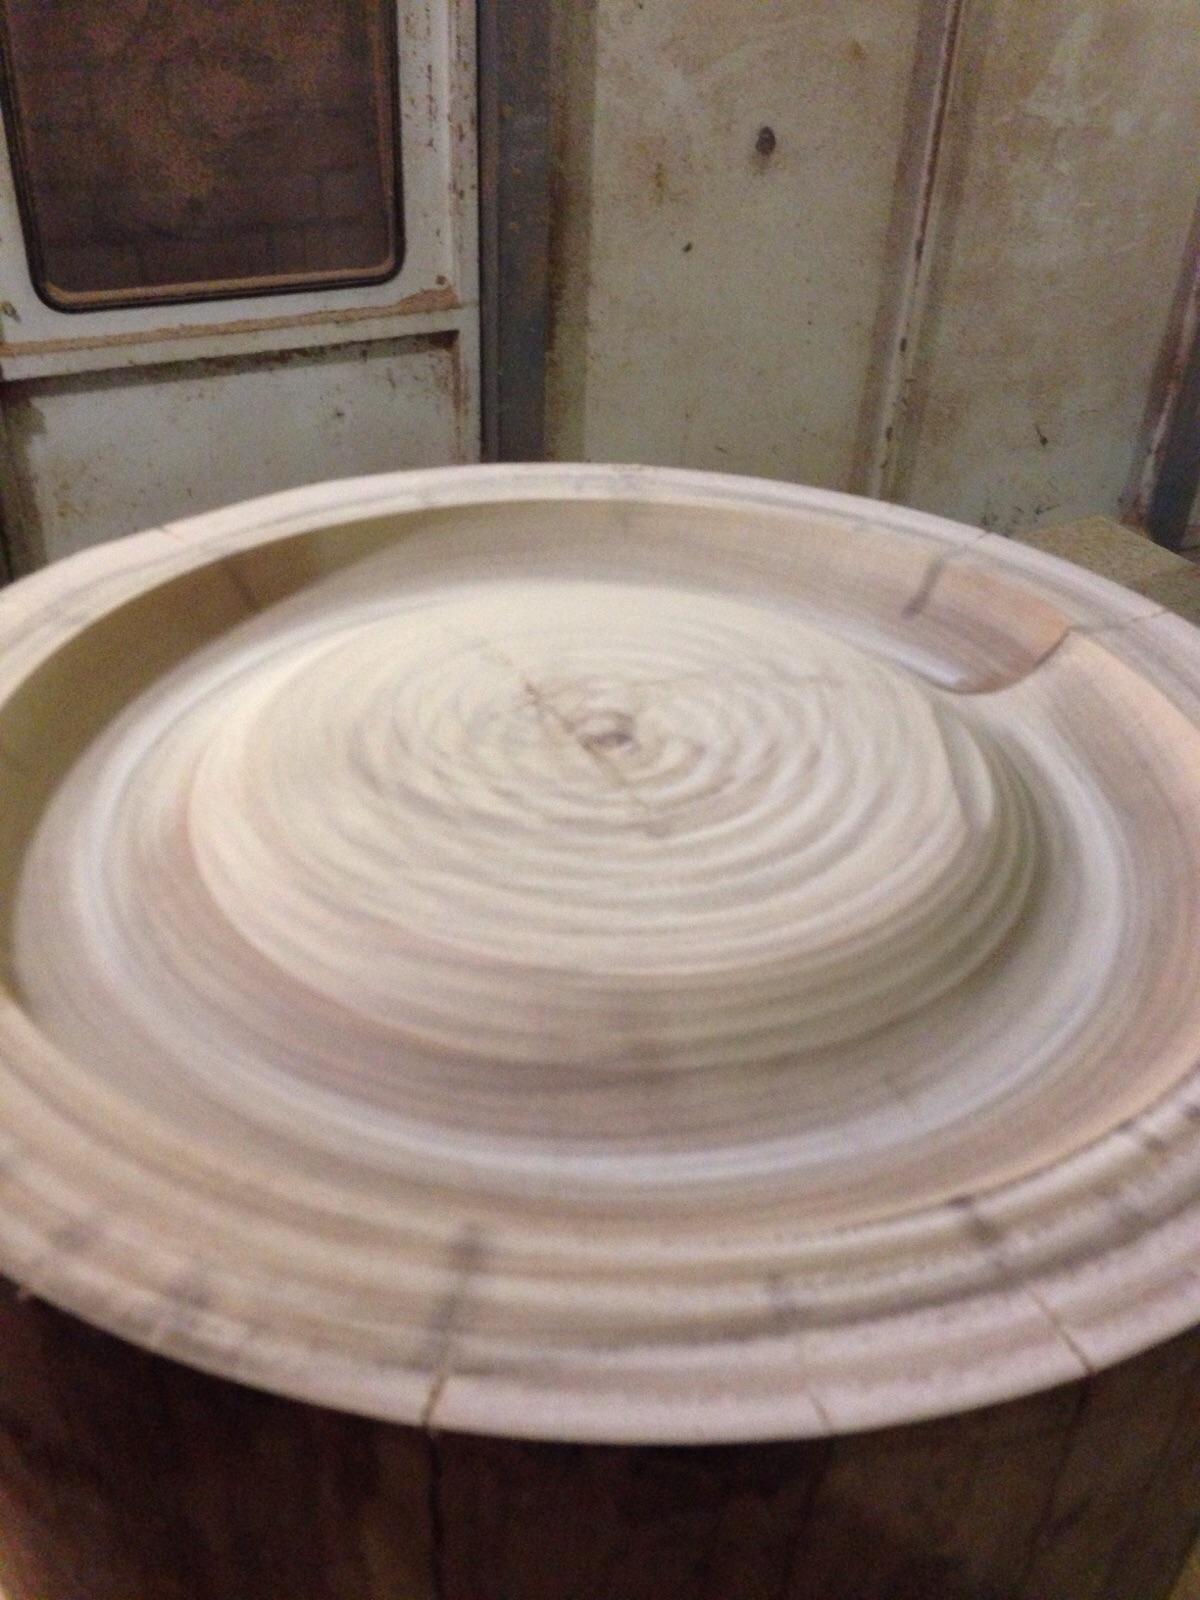 Rotsen Furniture – One-of-a-kind, the art of custom furniture